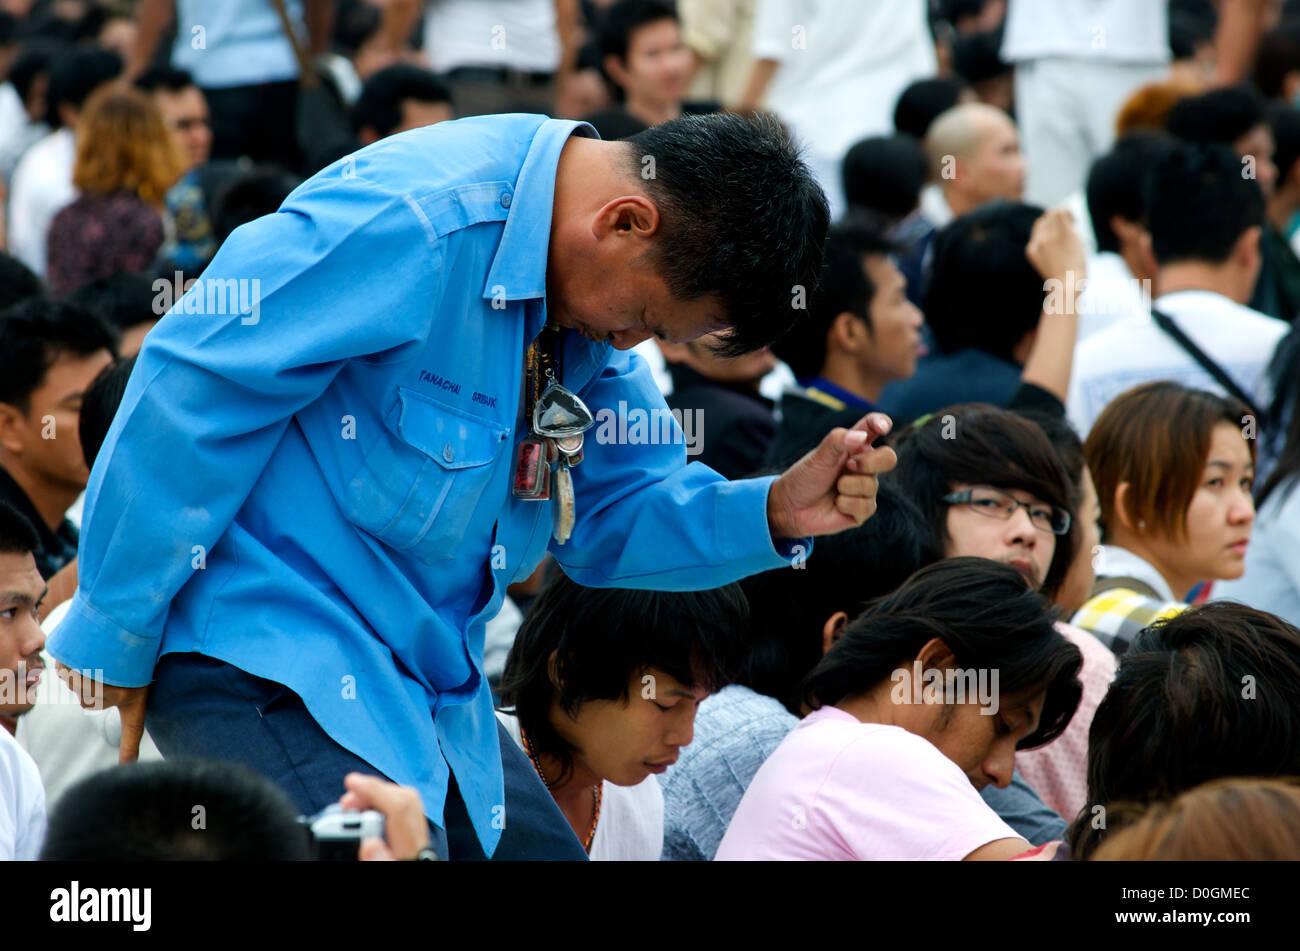 Thai Man in Trance, Wai Khru (Honour the Teacher) Tattoo Festival, Wat Bang Phra, Nakhon Pathom Province, Thailand - Stock Image